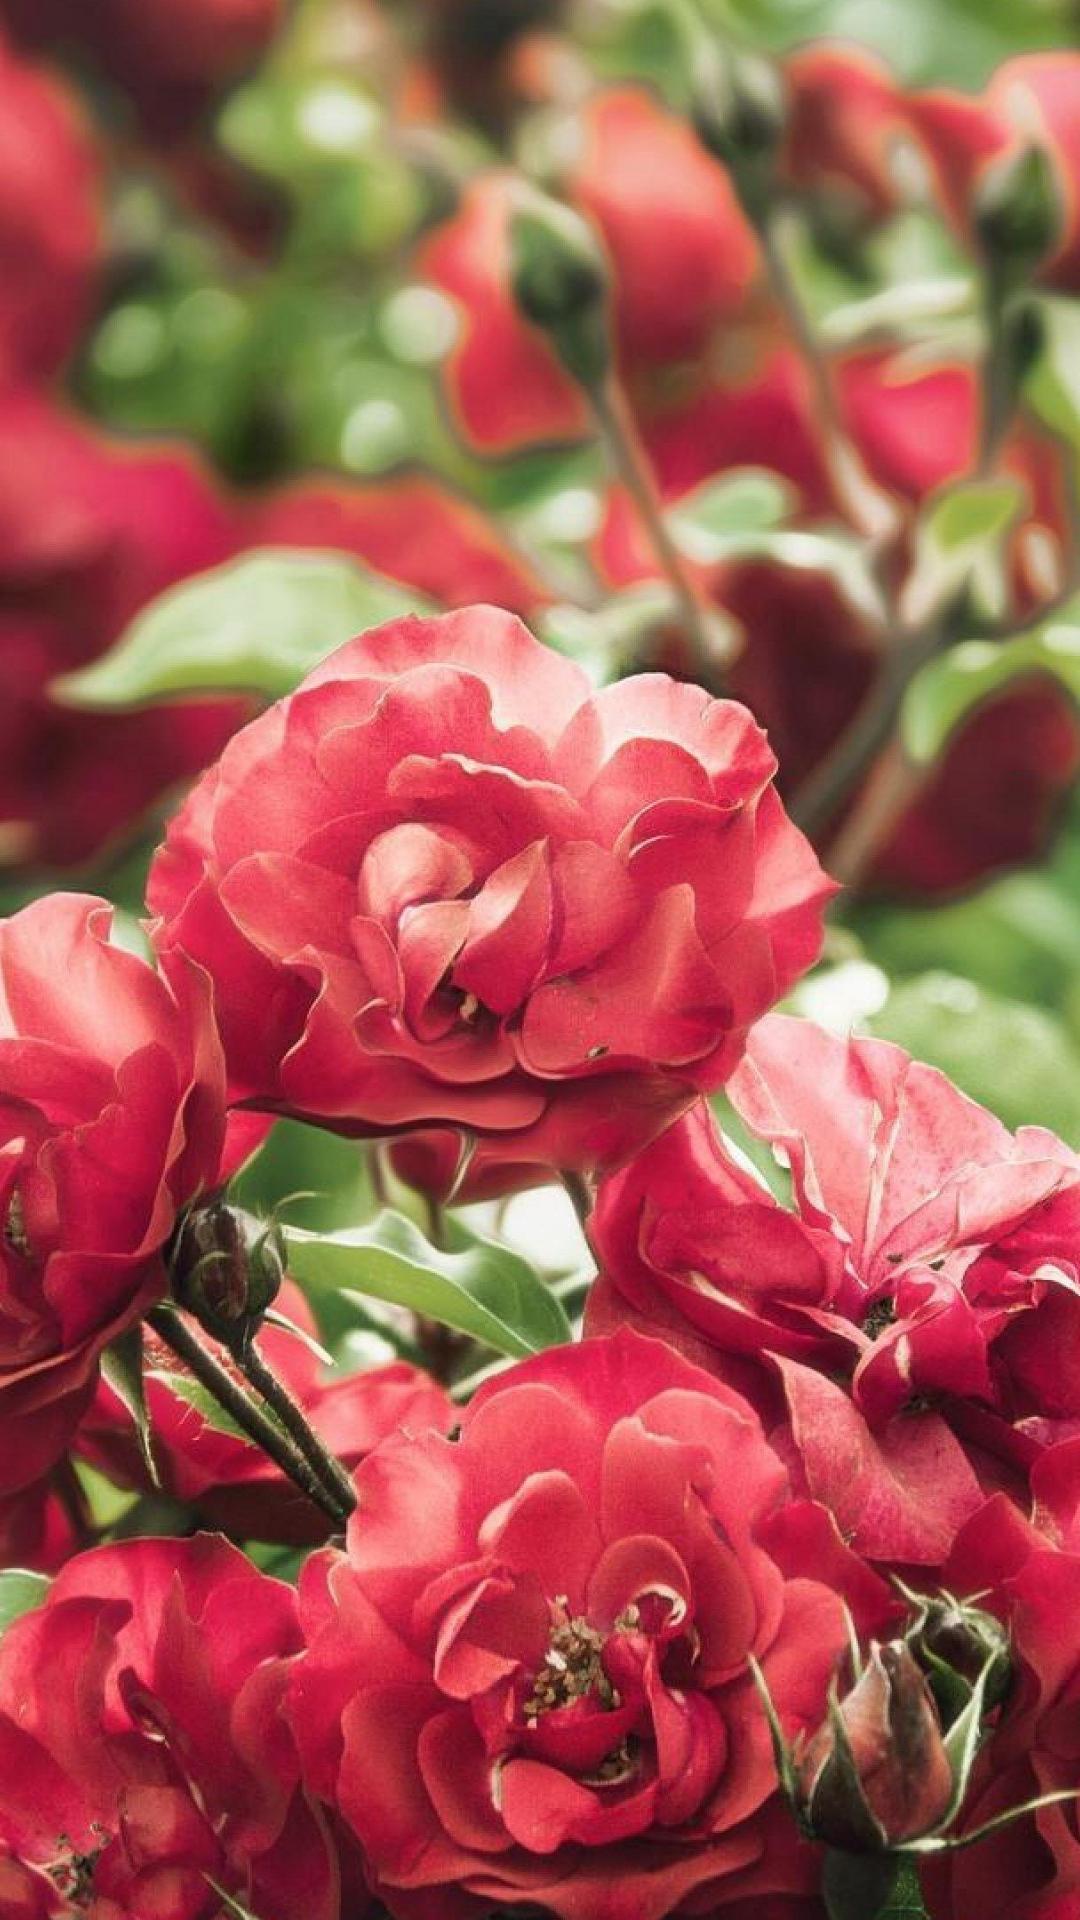 Free Download Roses Flowers Wallpaper 4k Ultra Hd Wallpaper Ololoshenka 4096x2160 For Your Desktop Mobile Tablet Explore 24 Roses Flower 4k Wallpapers Roses Flower 4k Wallpapers Flower Print Wallpaper